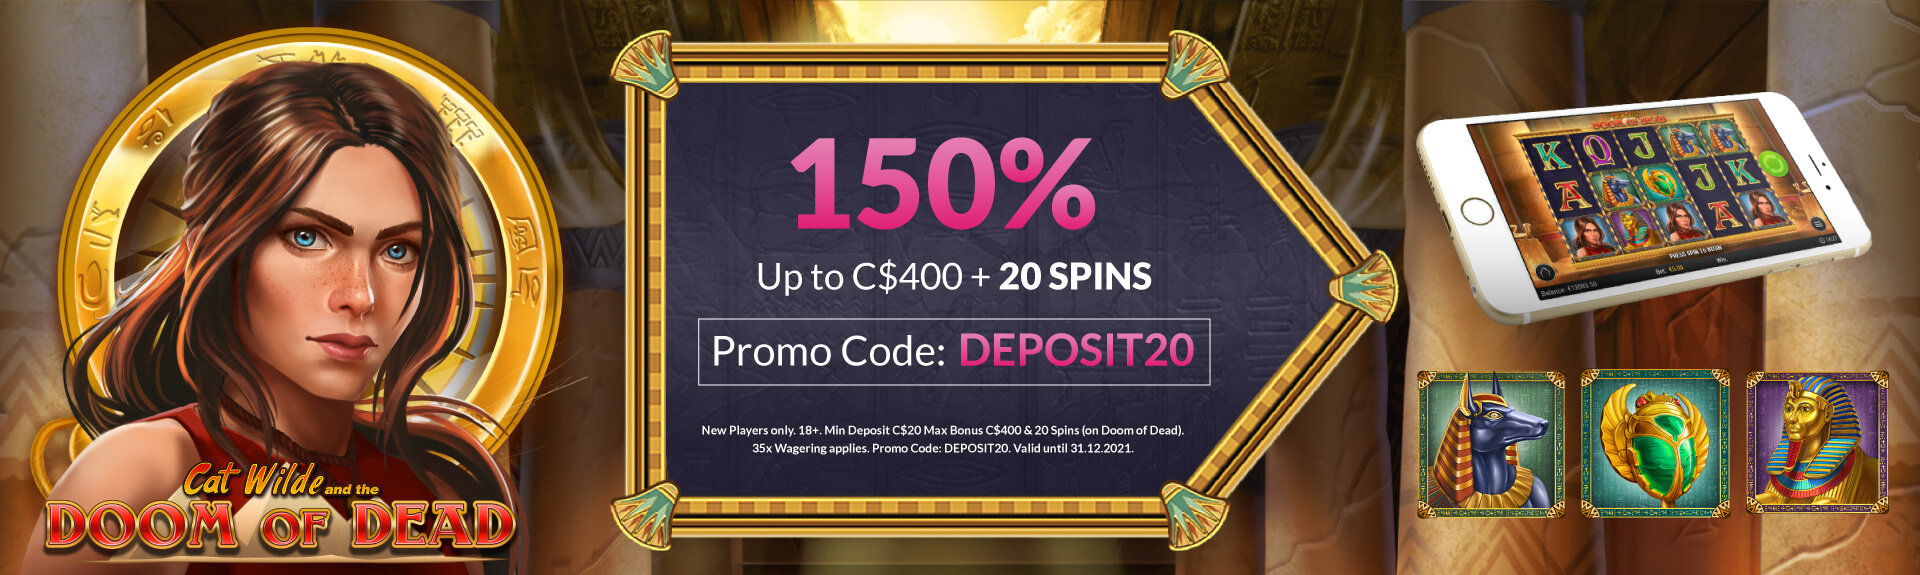 Club Player Casino No Deposit Codes 2021